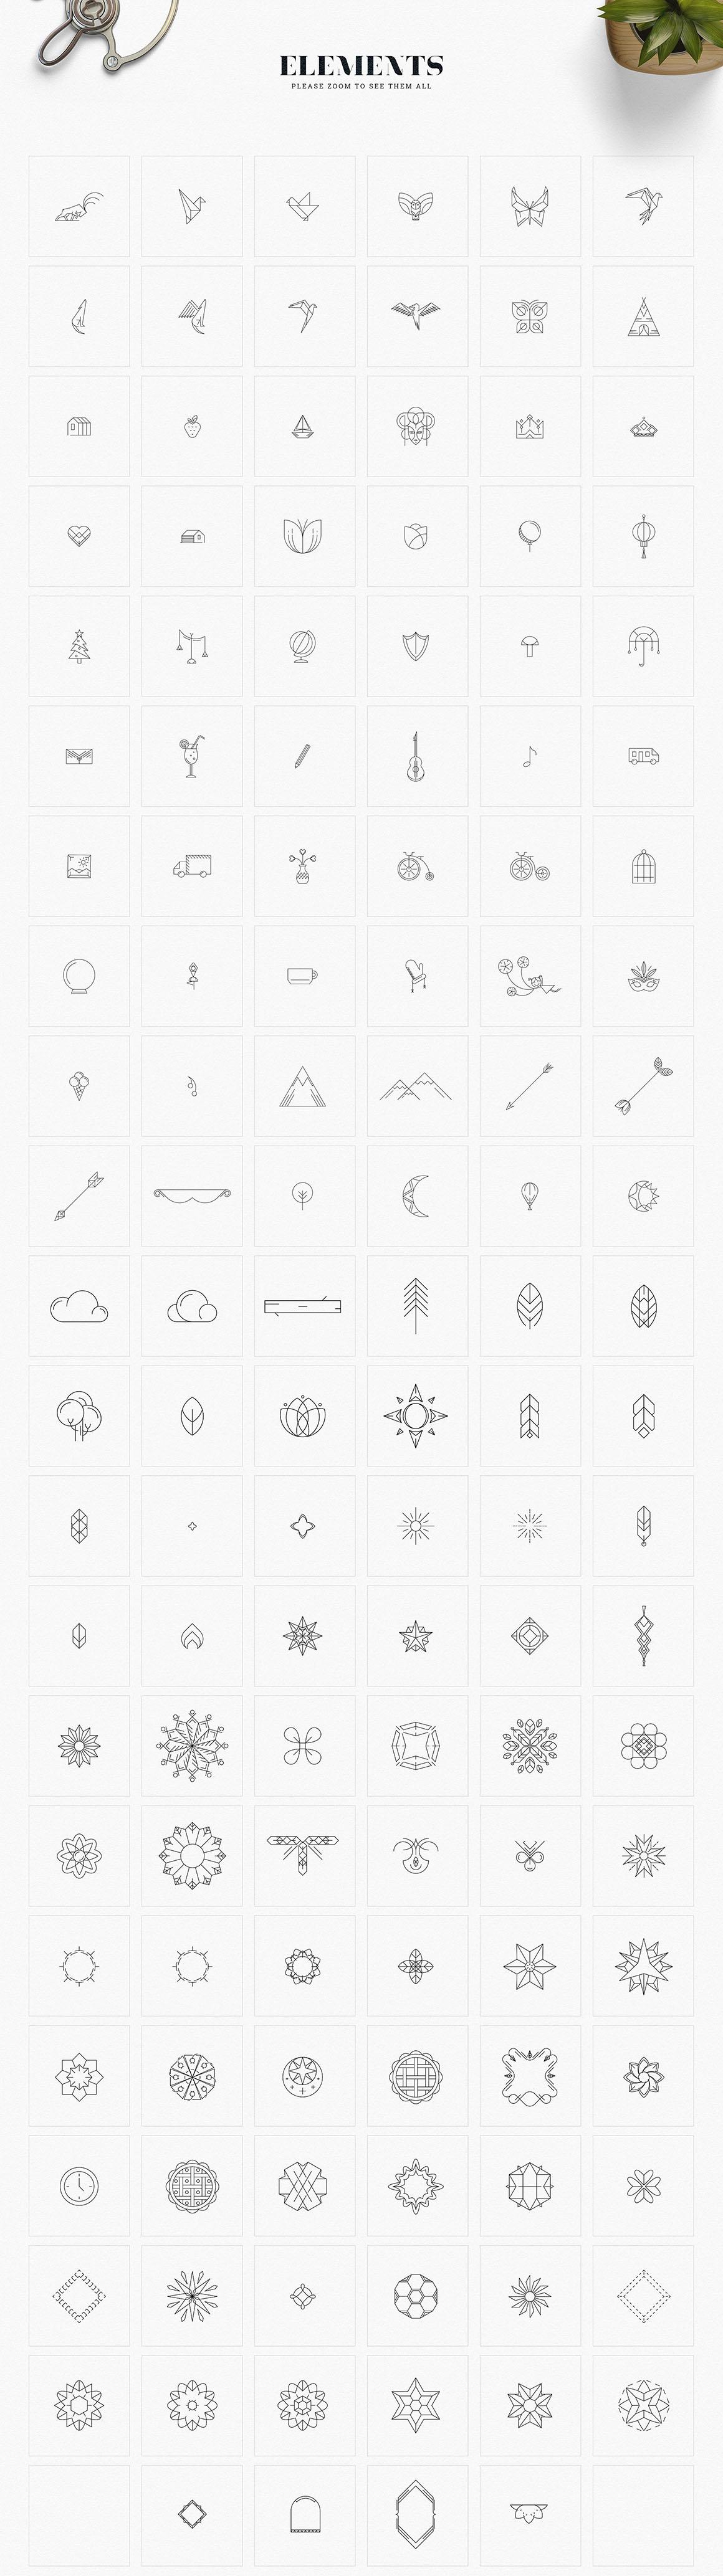 Branding-Craft-Kit-7.jpg